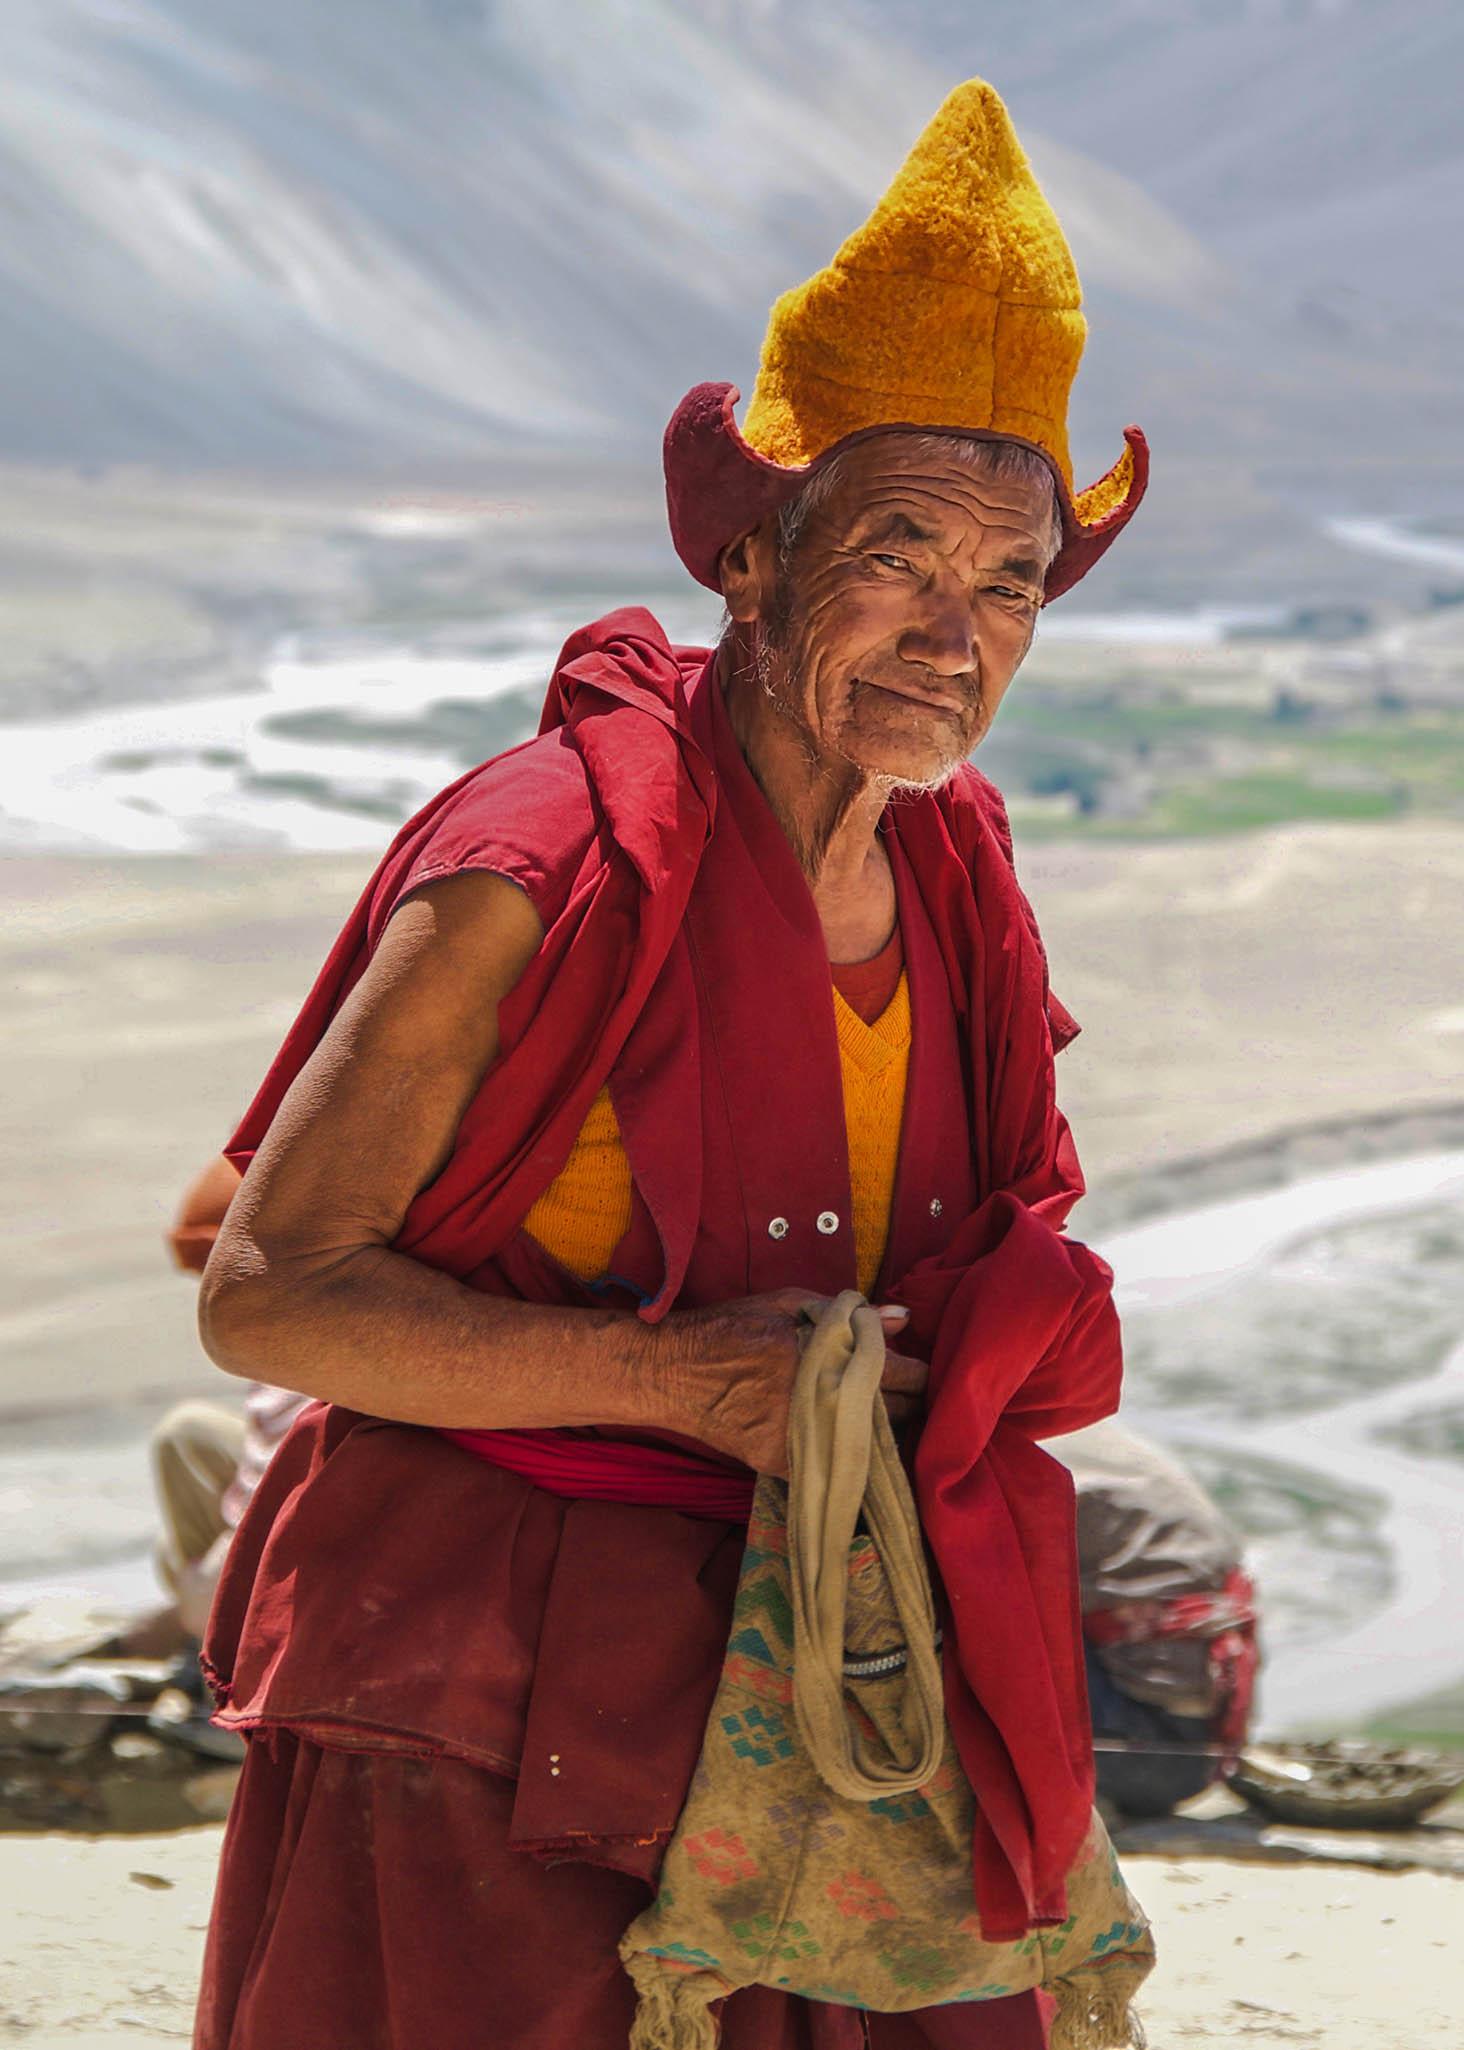 Klooster Padum Ladakh 3.7.3 DSC_0899